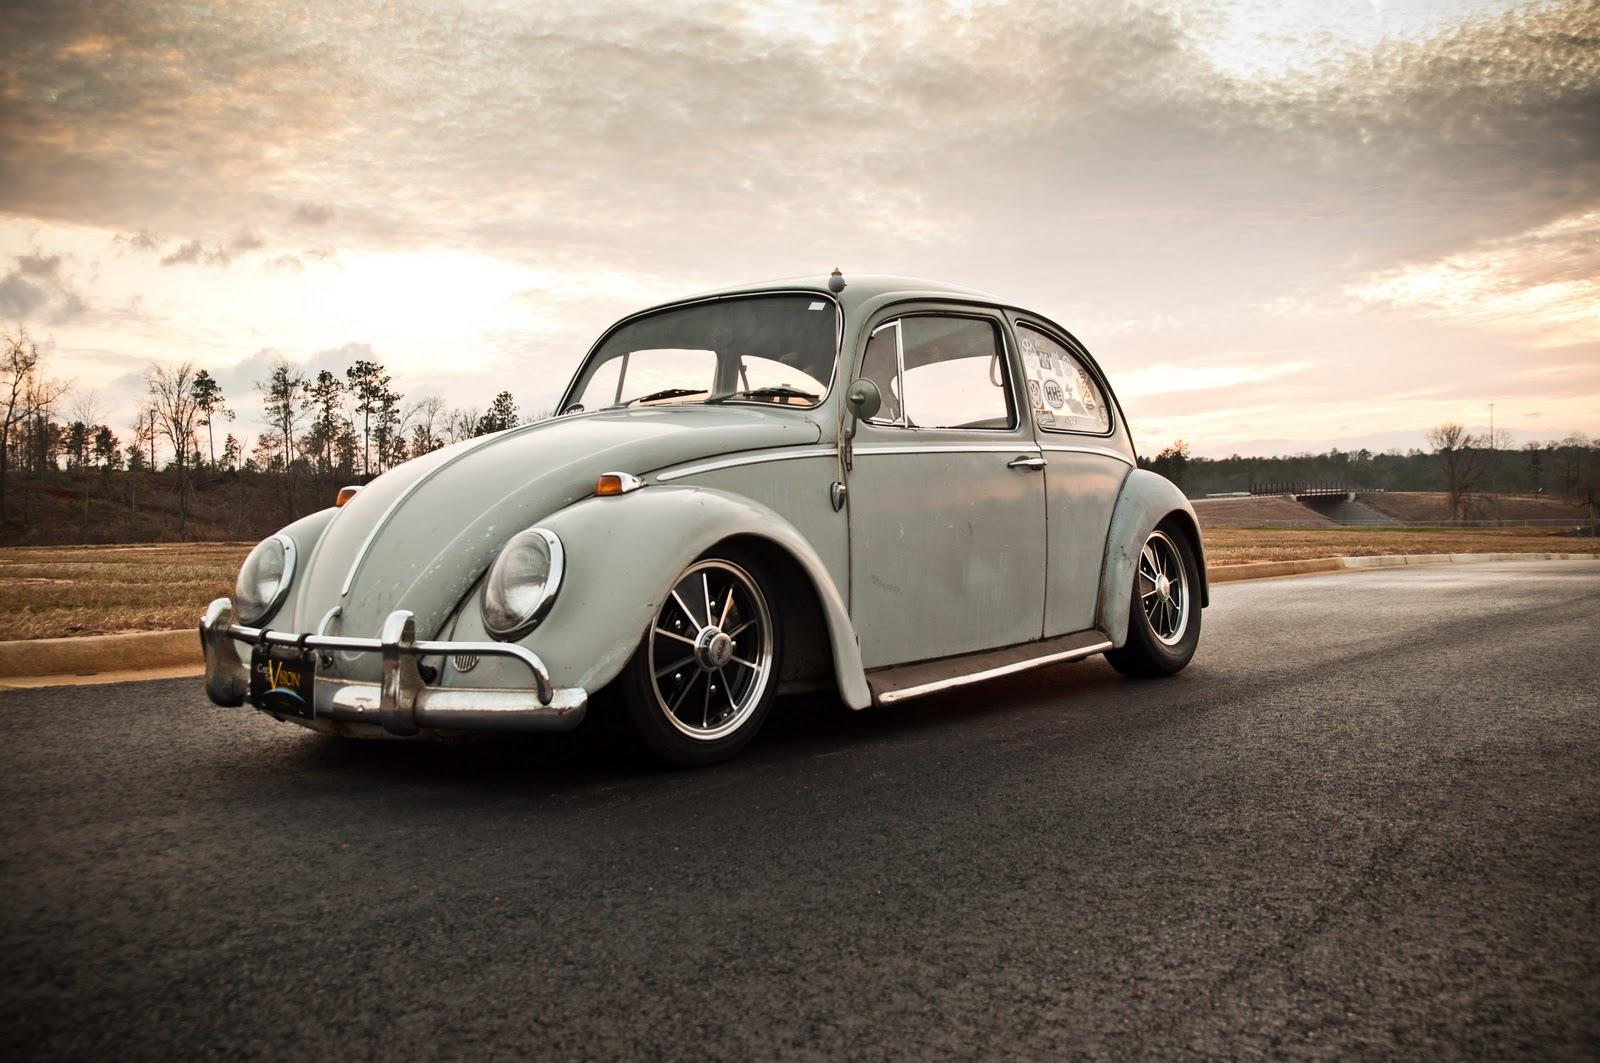 Otis - my '65 Beetle DSC_0044